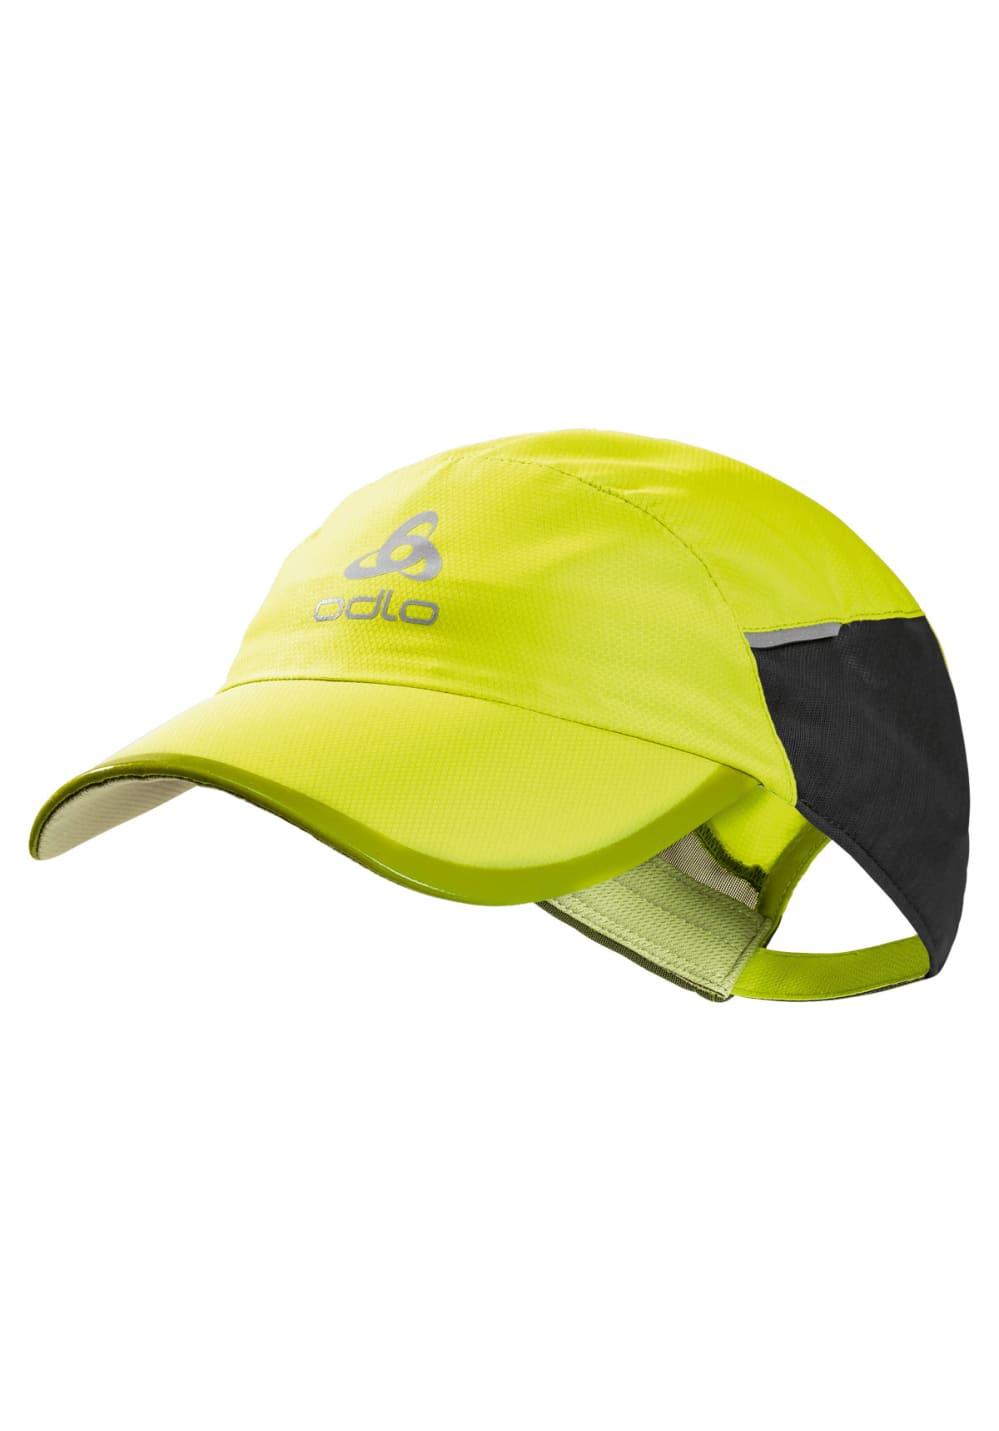 Odlo Cap Fast & Light Kopfbedeckung - Gelb, Gr. S/M